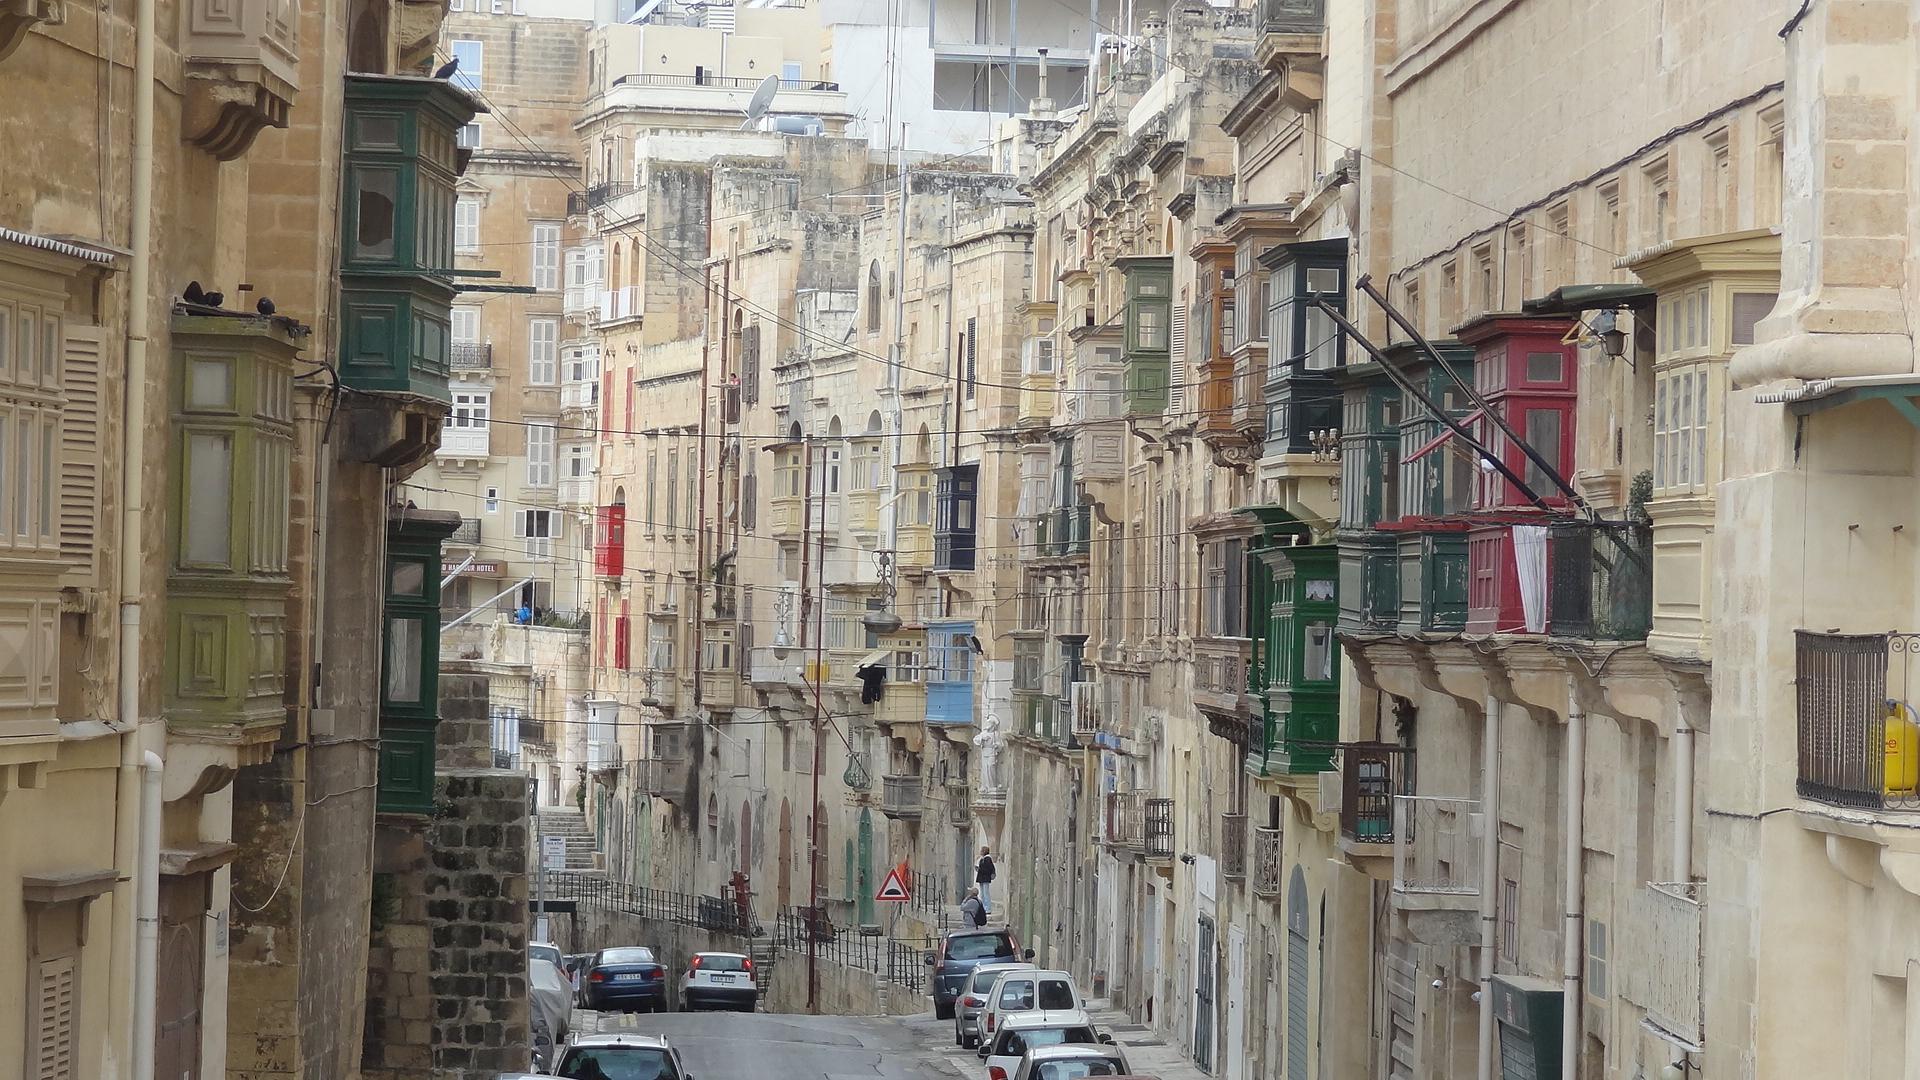 Malta 1 by Simeon Stoichkov